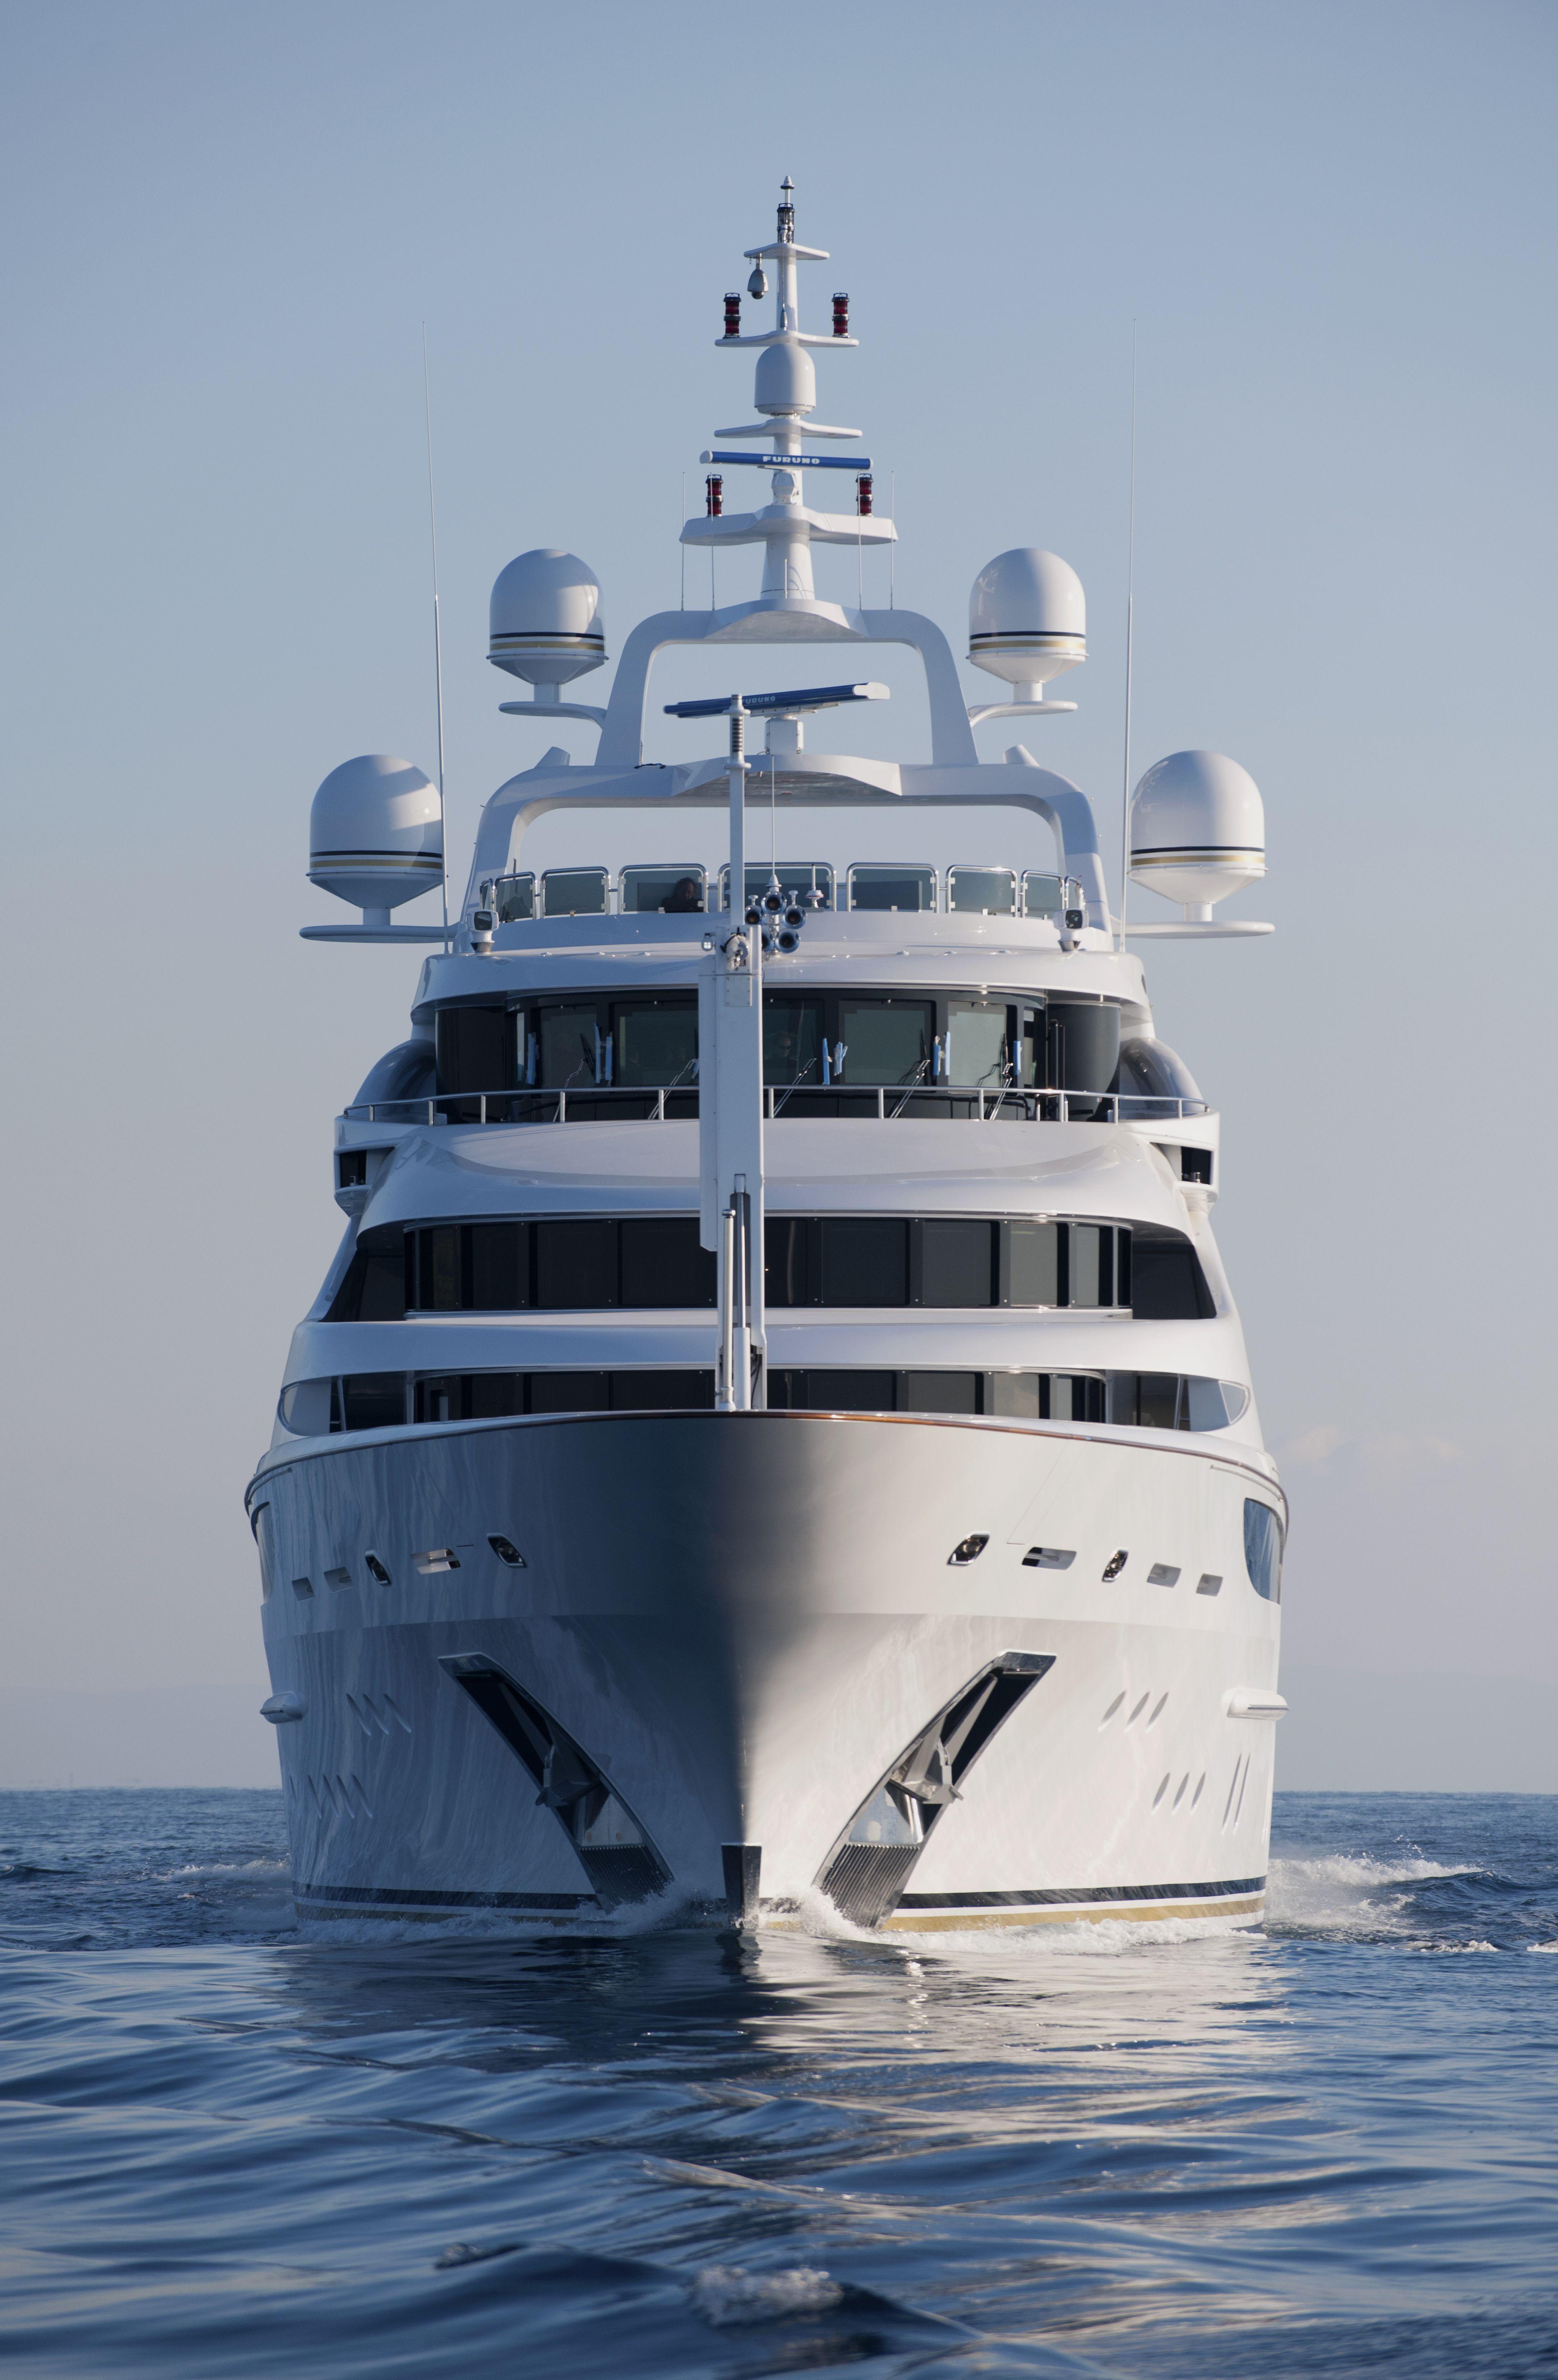 Diamonds Are Forever, Benetti Yachts  #benetti #yacht #style #luxury #diamonds #forever  www.benettiyachts.it  http://www.yachtemoceans.com/diamonds-are-forever-fb-253-benetti-yachts/  #superyacht #megayacht #yacht